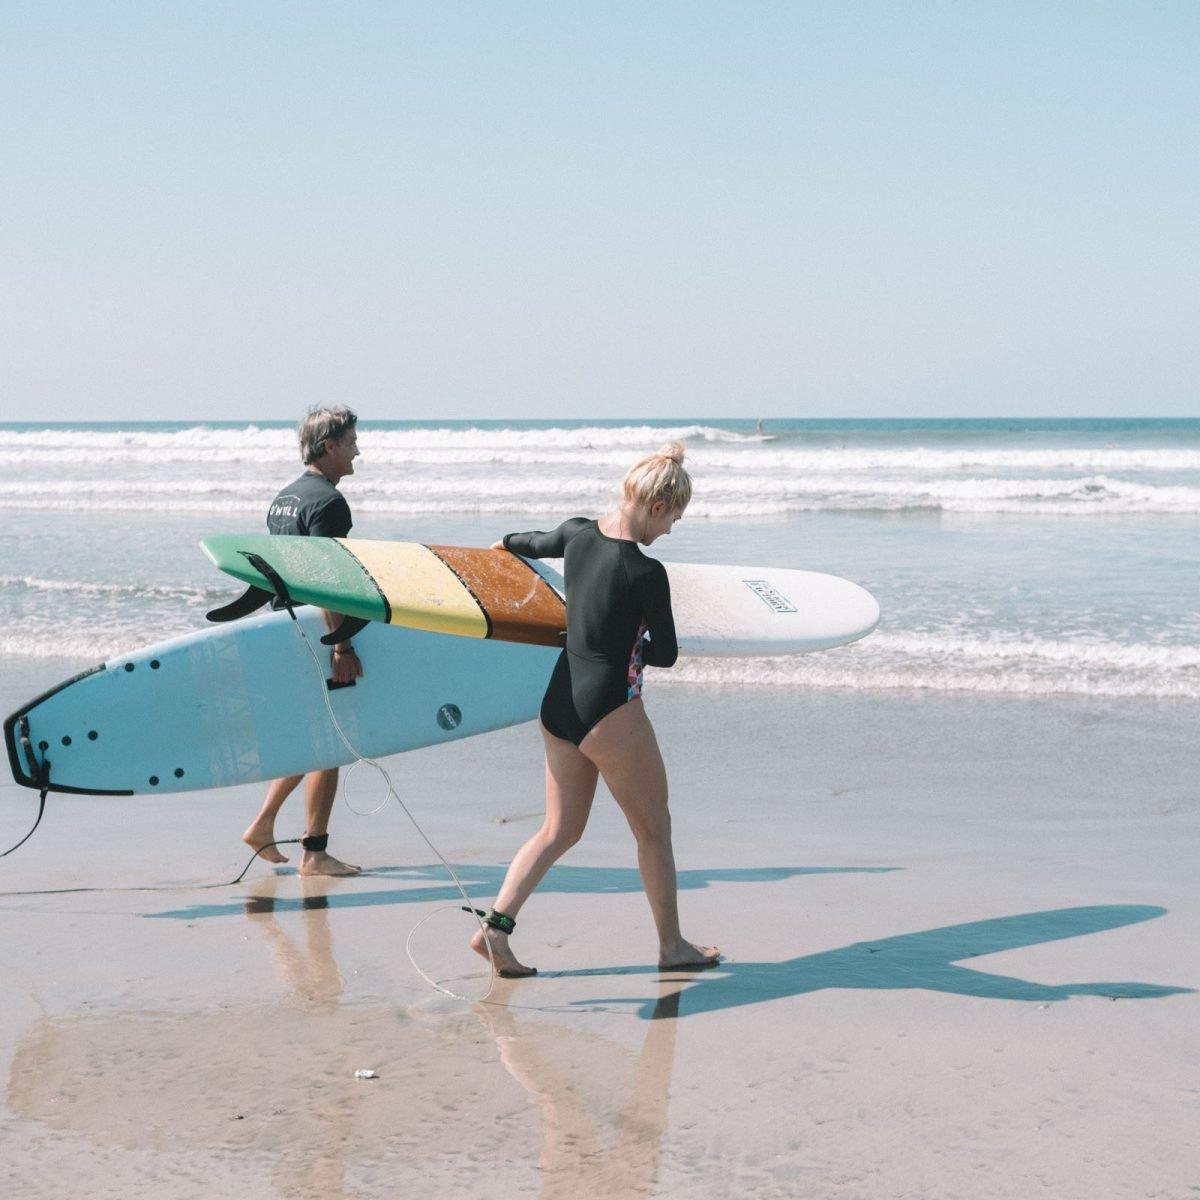 Surfers Nosara